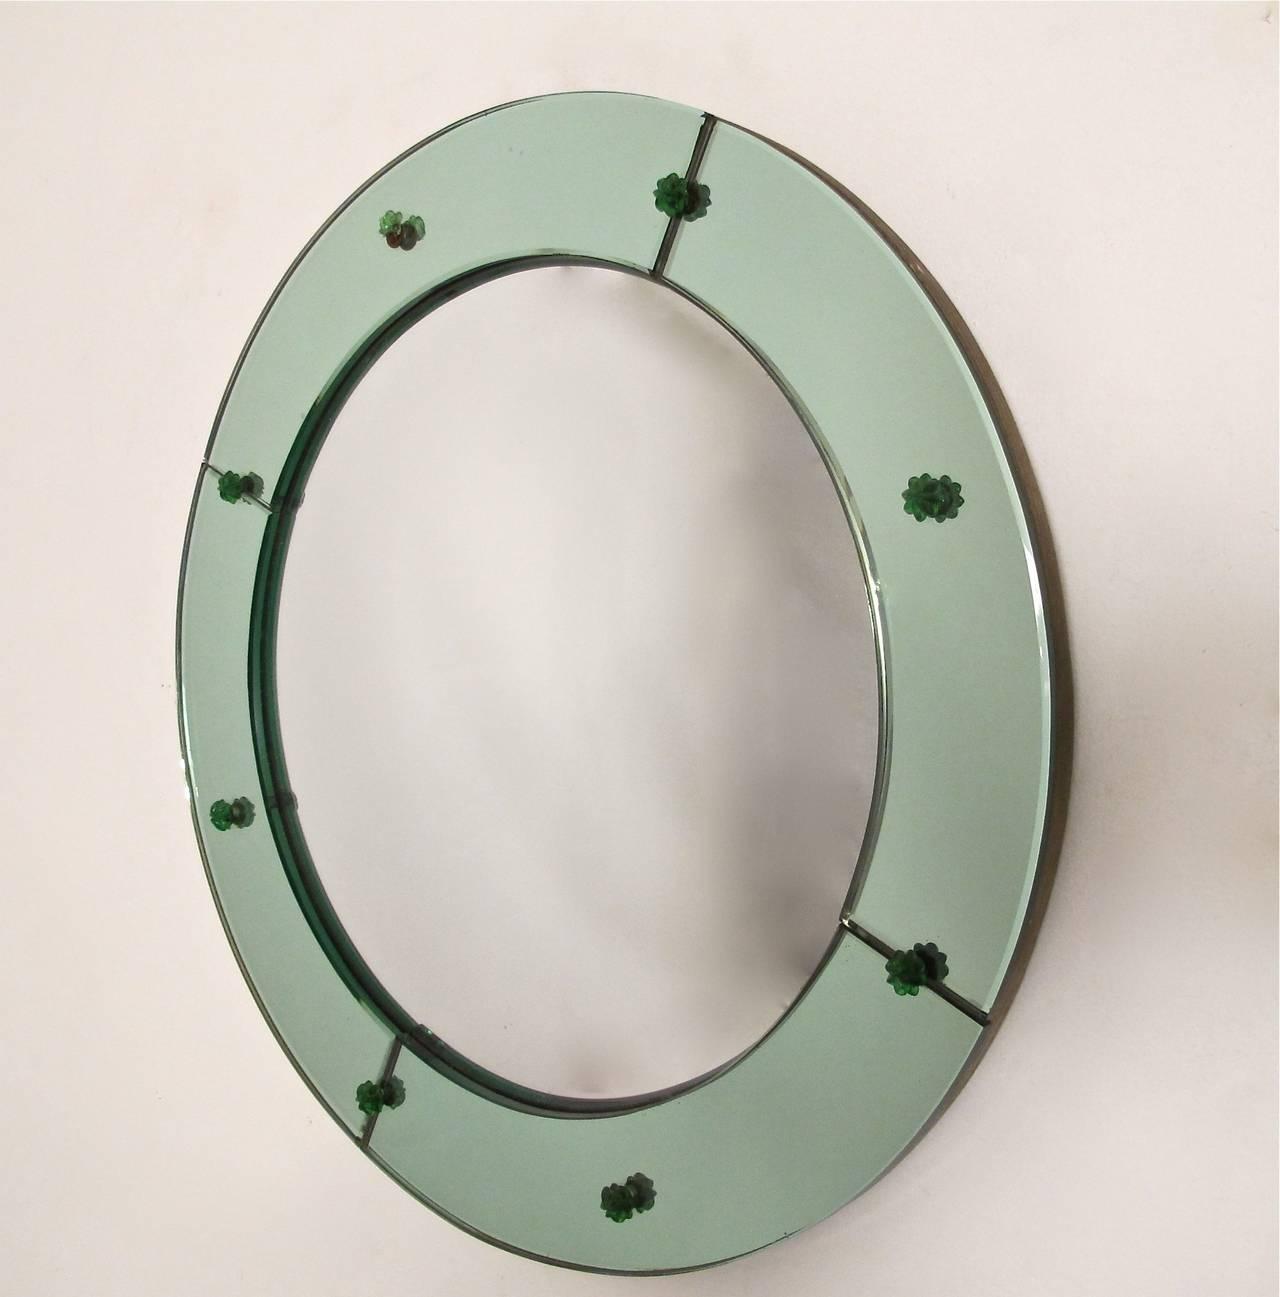 Mid-20th Century Art Deco Convex Mirror For Sale